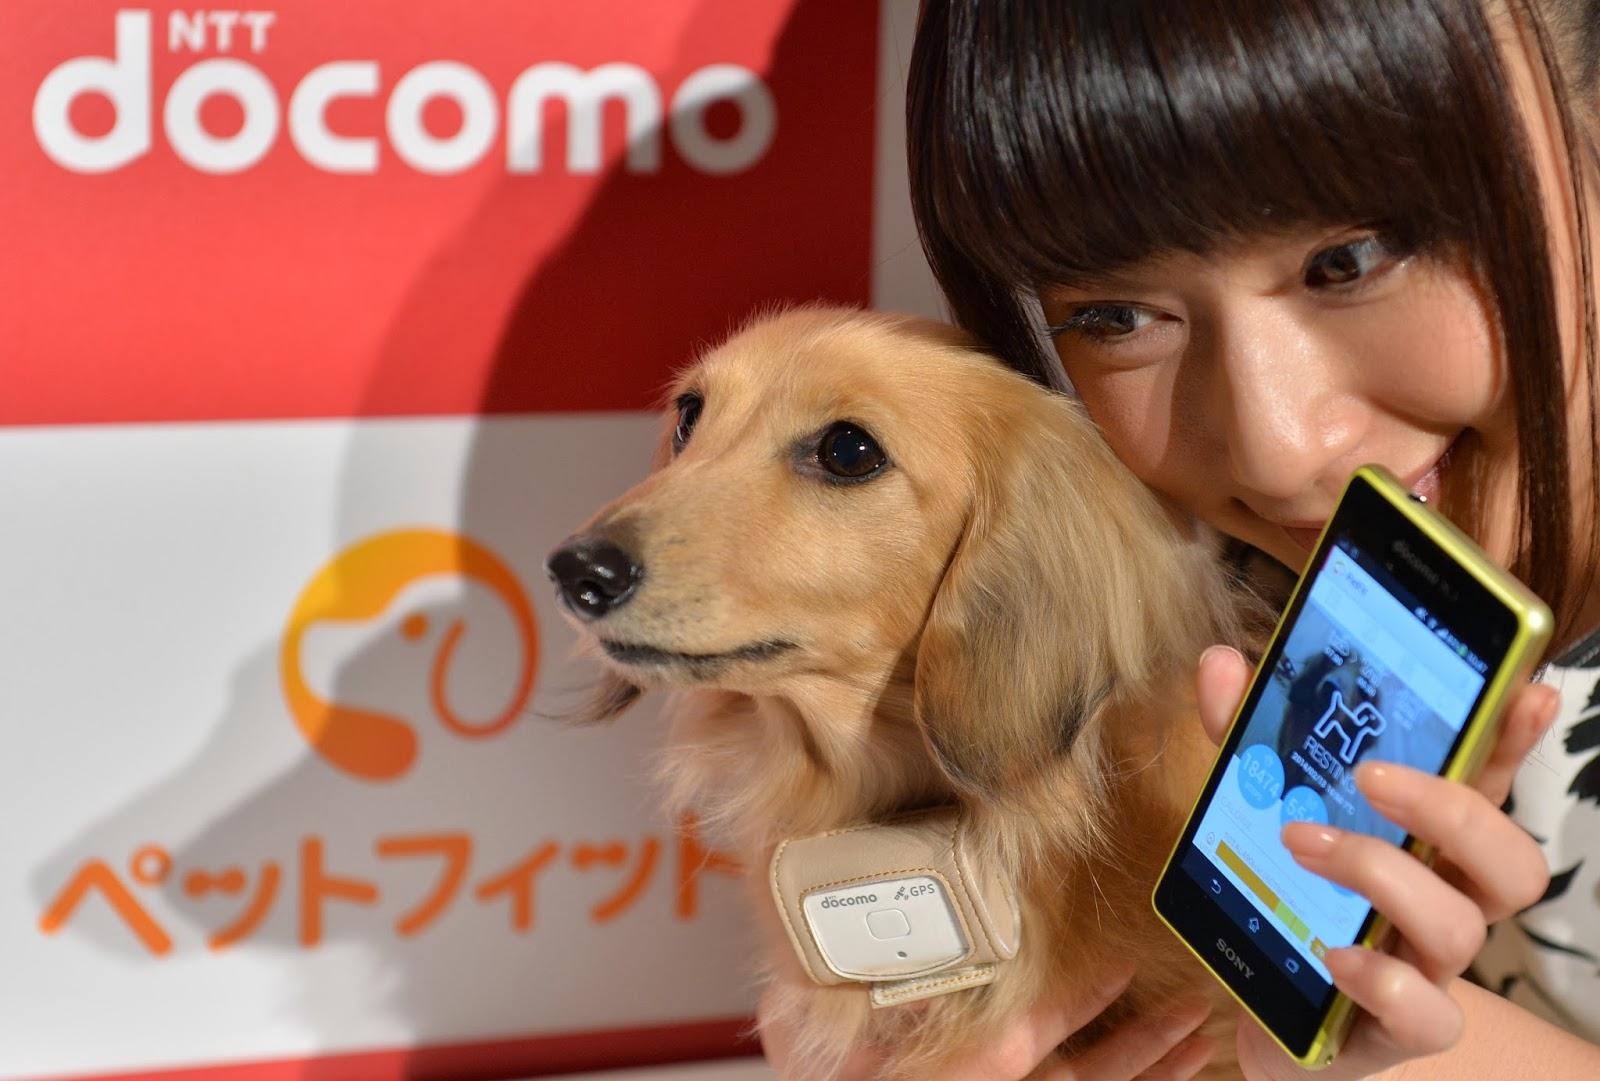 Animal, App, Application, Dog, Health, Japan, Mobile, Model, NTT Docomo, Offbeat, PC, Petfit tag, Phone, Science, Technology, Tokyo,